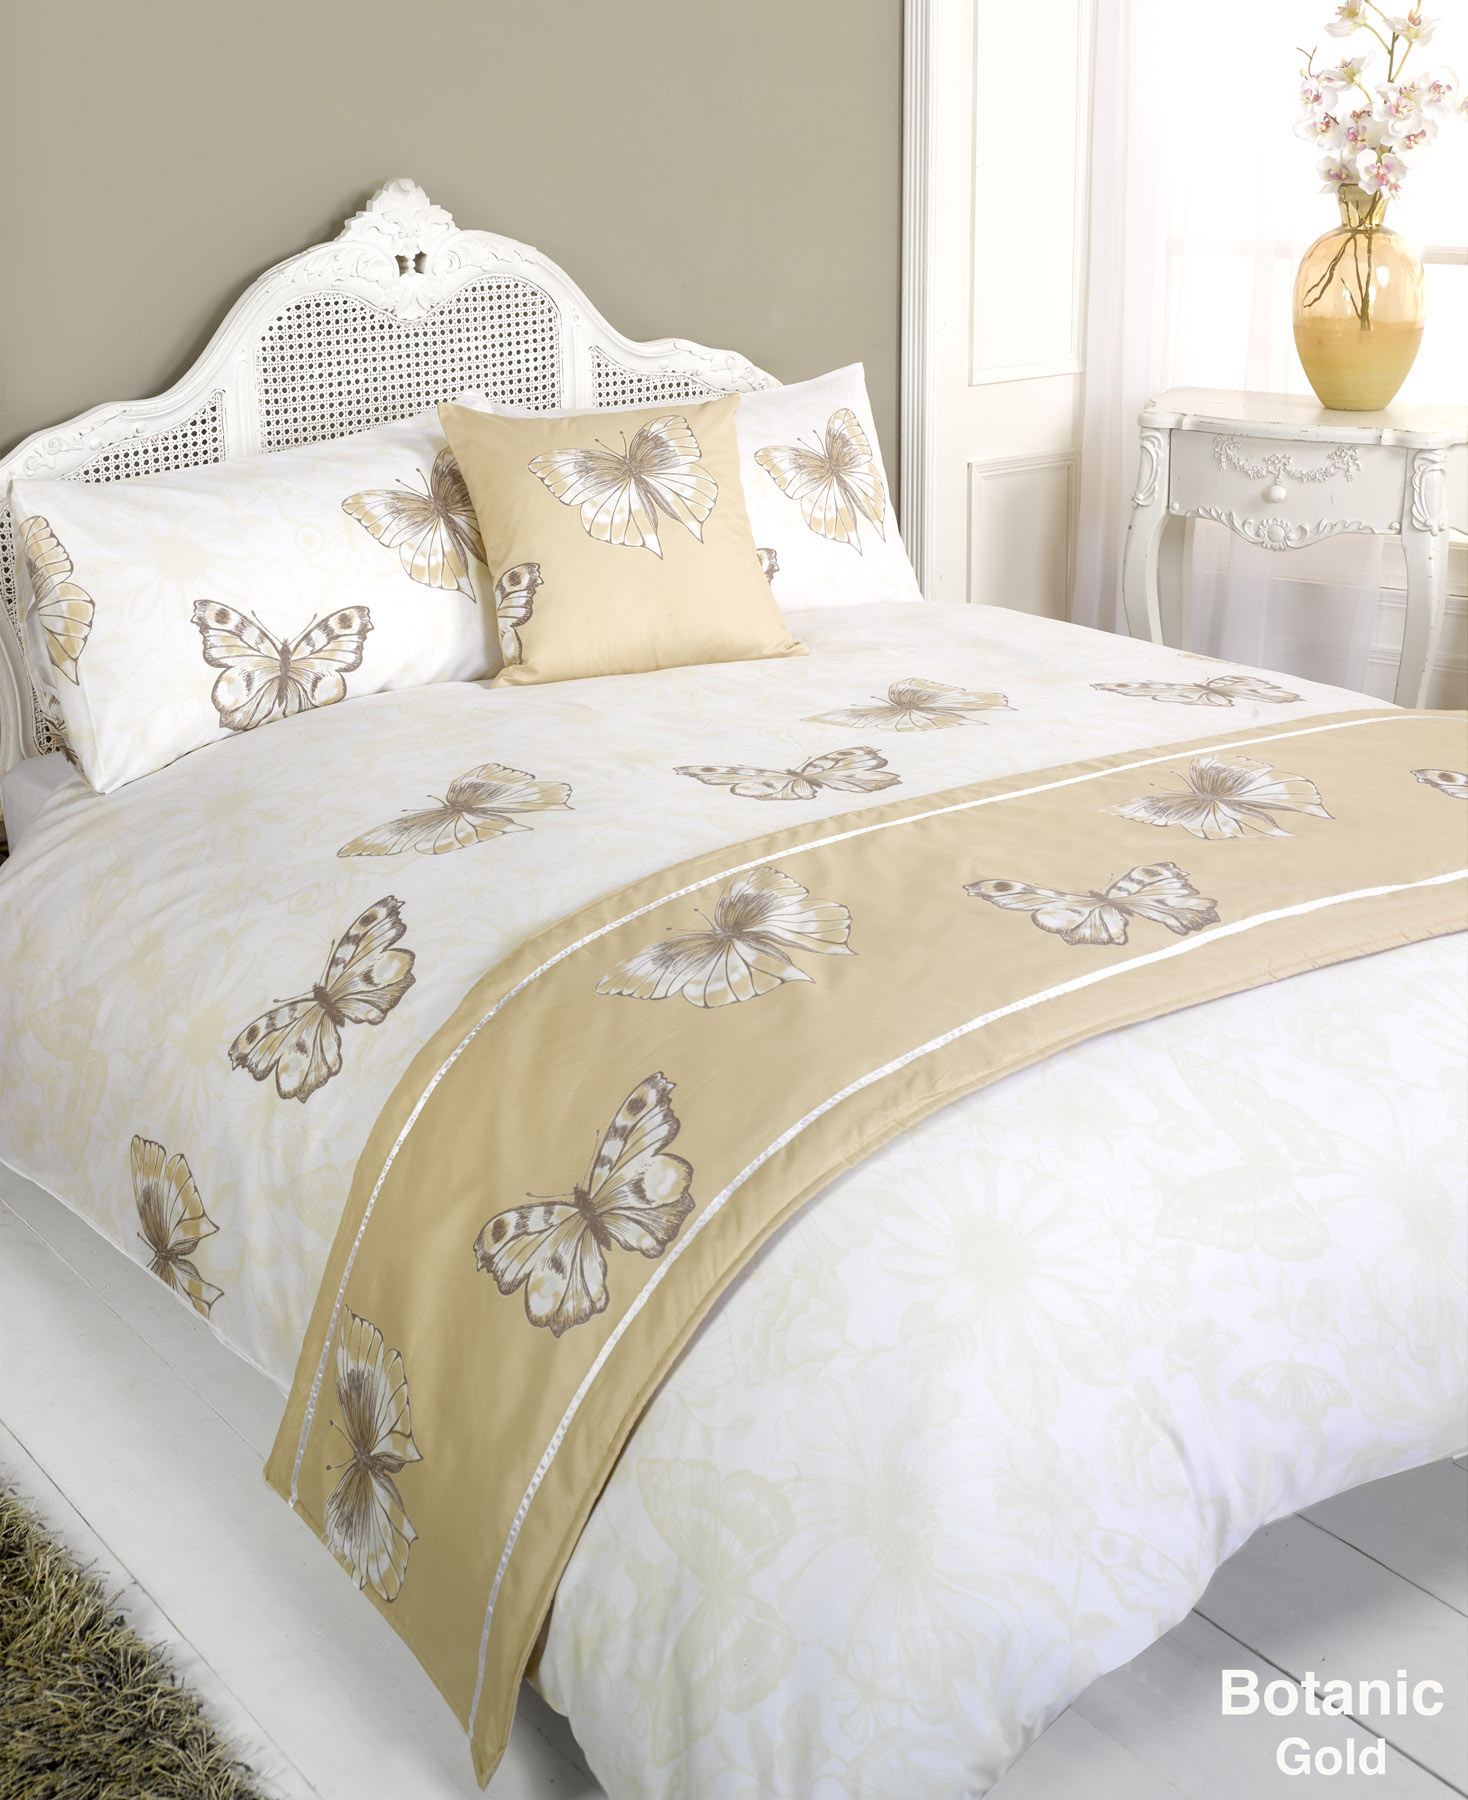 edred n colcha ropa de cama juego dorado individual doble king size super ebay. Black Bedroom Furniture Sets. Home Design Ideas